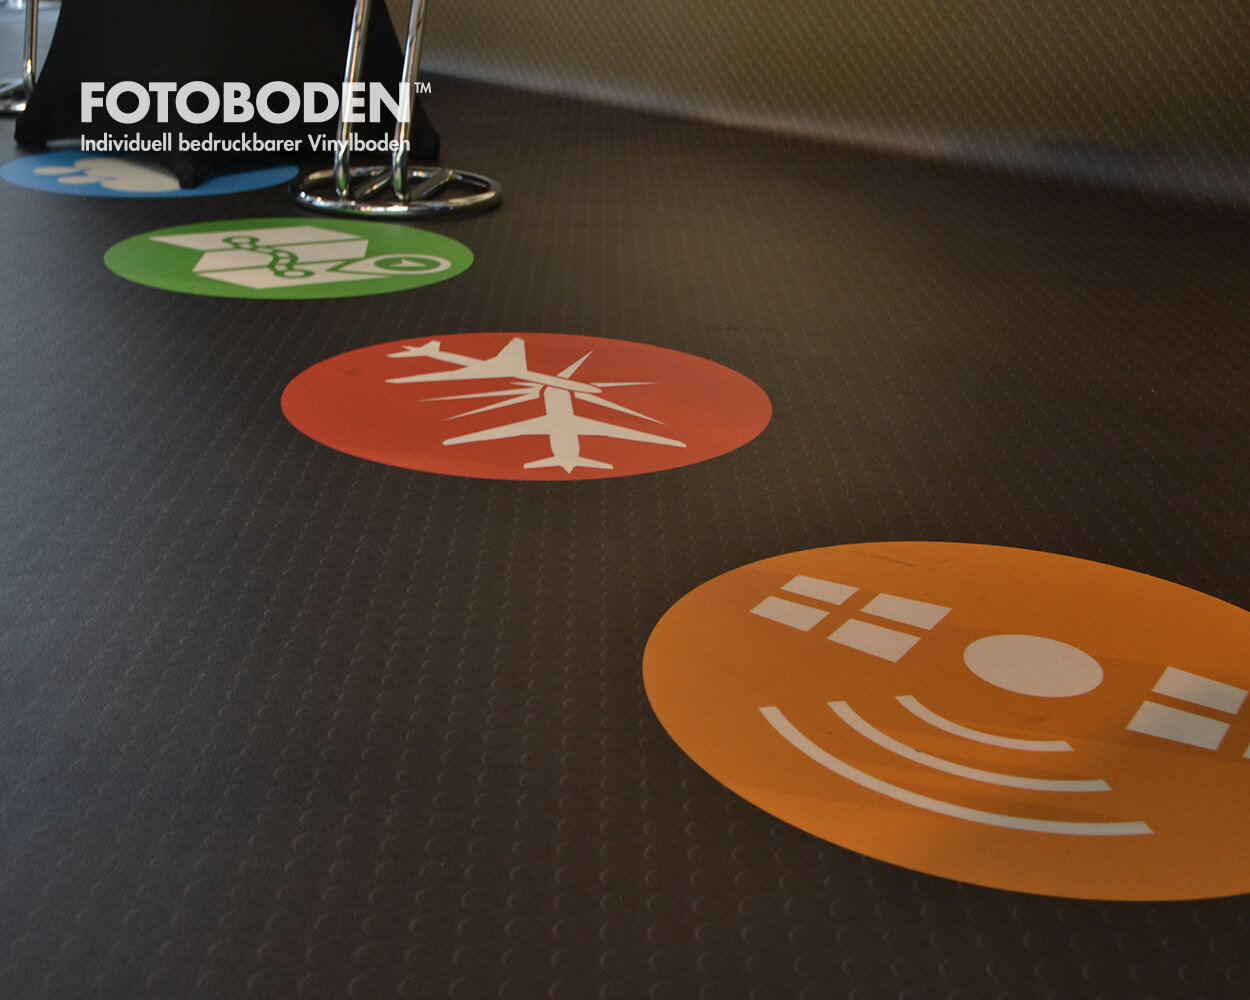 Bodenaufkleber Floor graphics Bodengestaltung